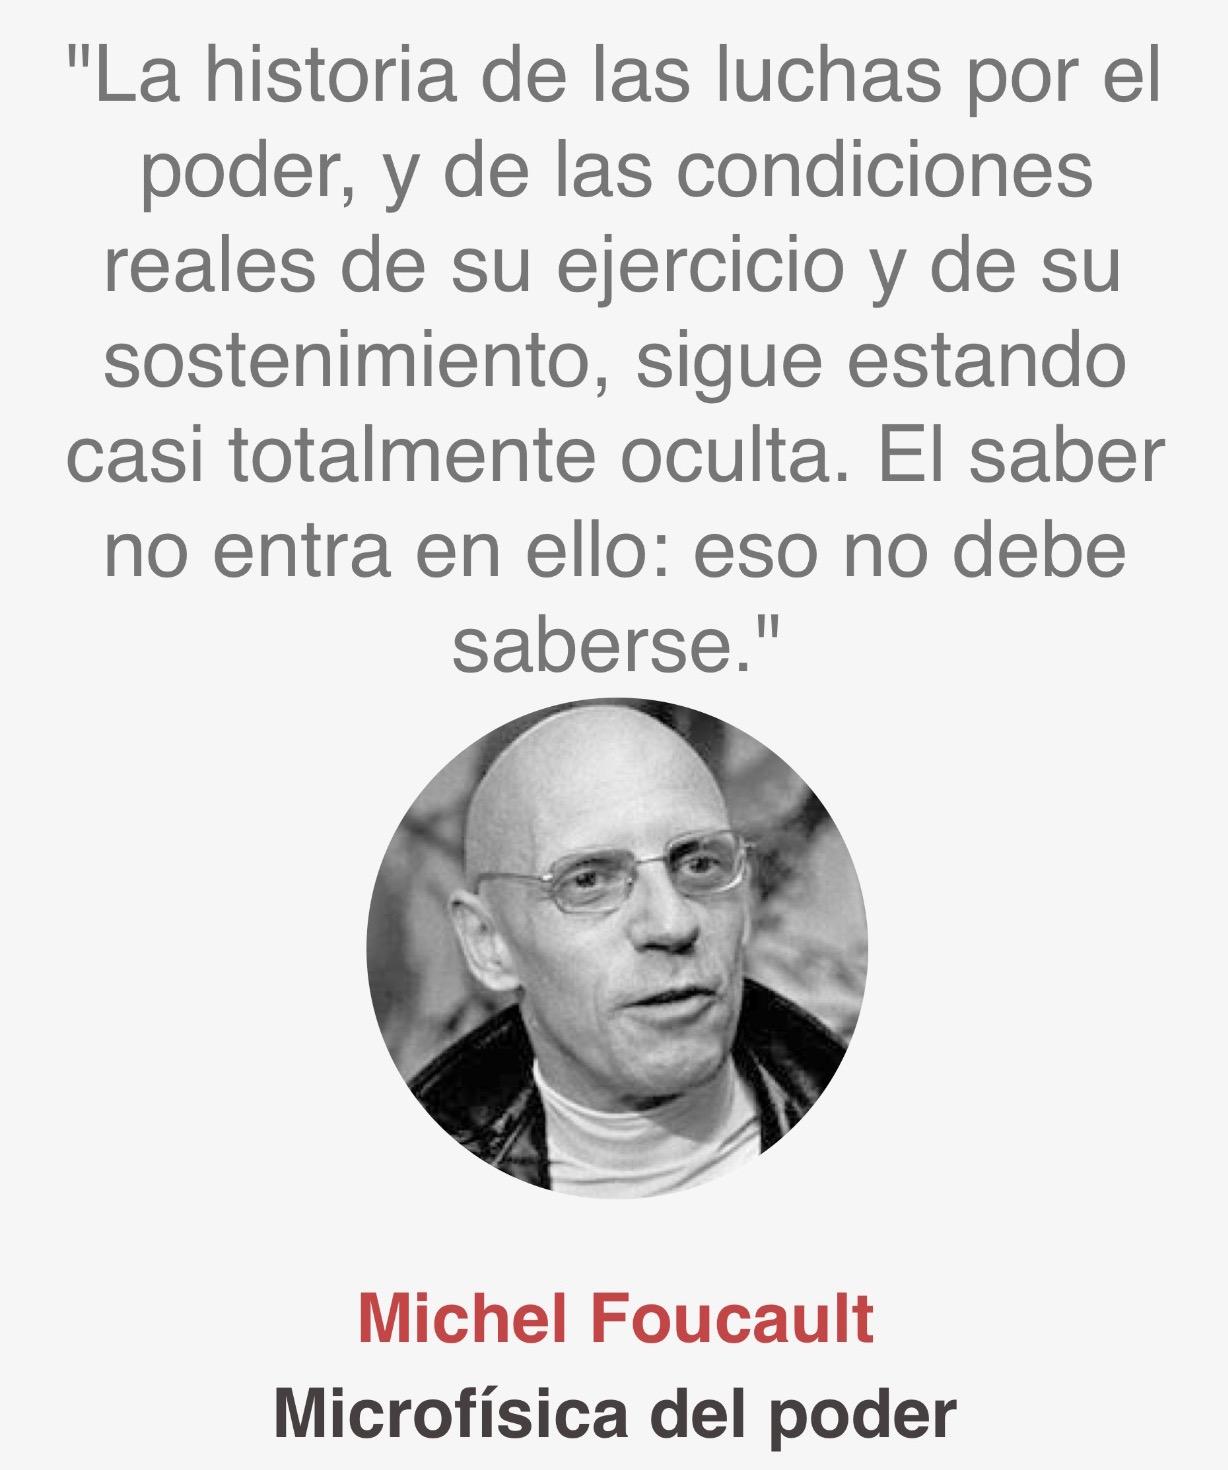 Cita Foucault